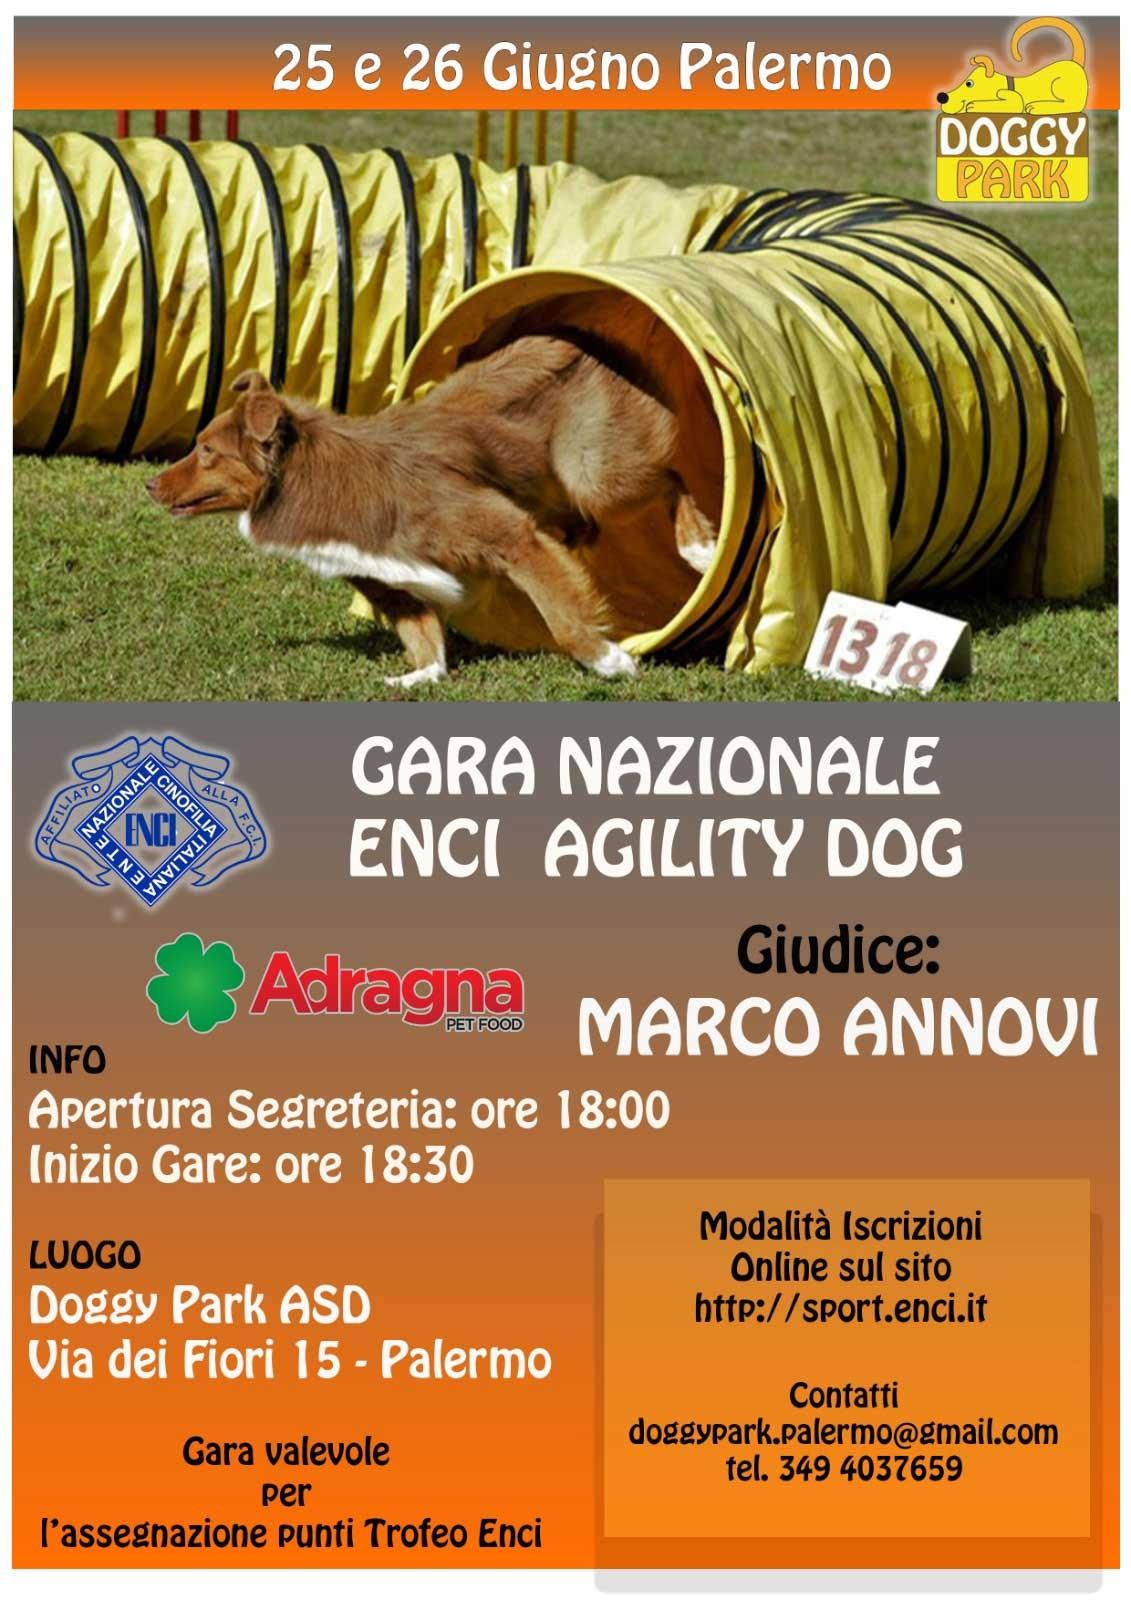 25 Giugno - Gara Agility Dog Doggy Park